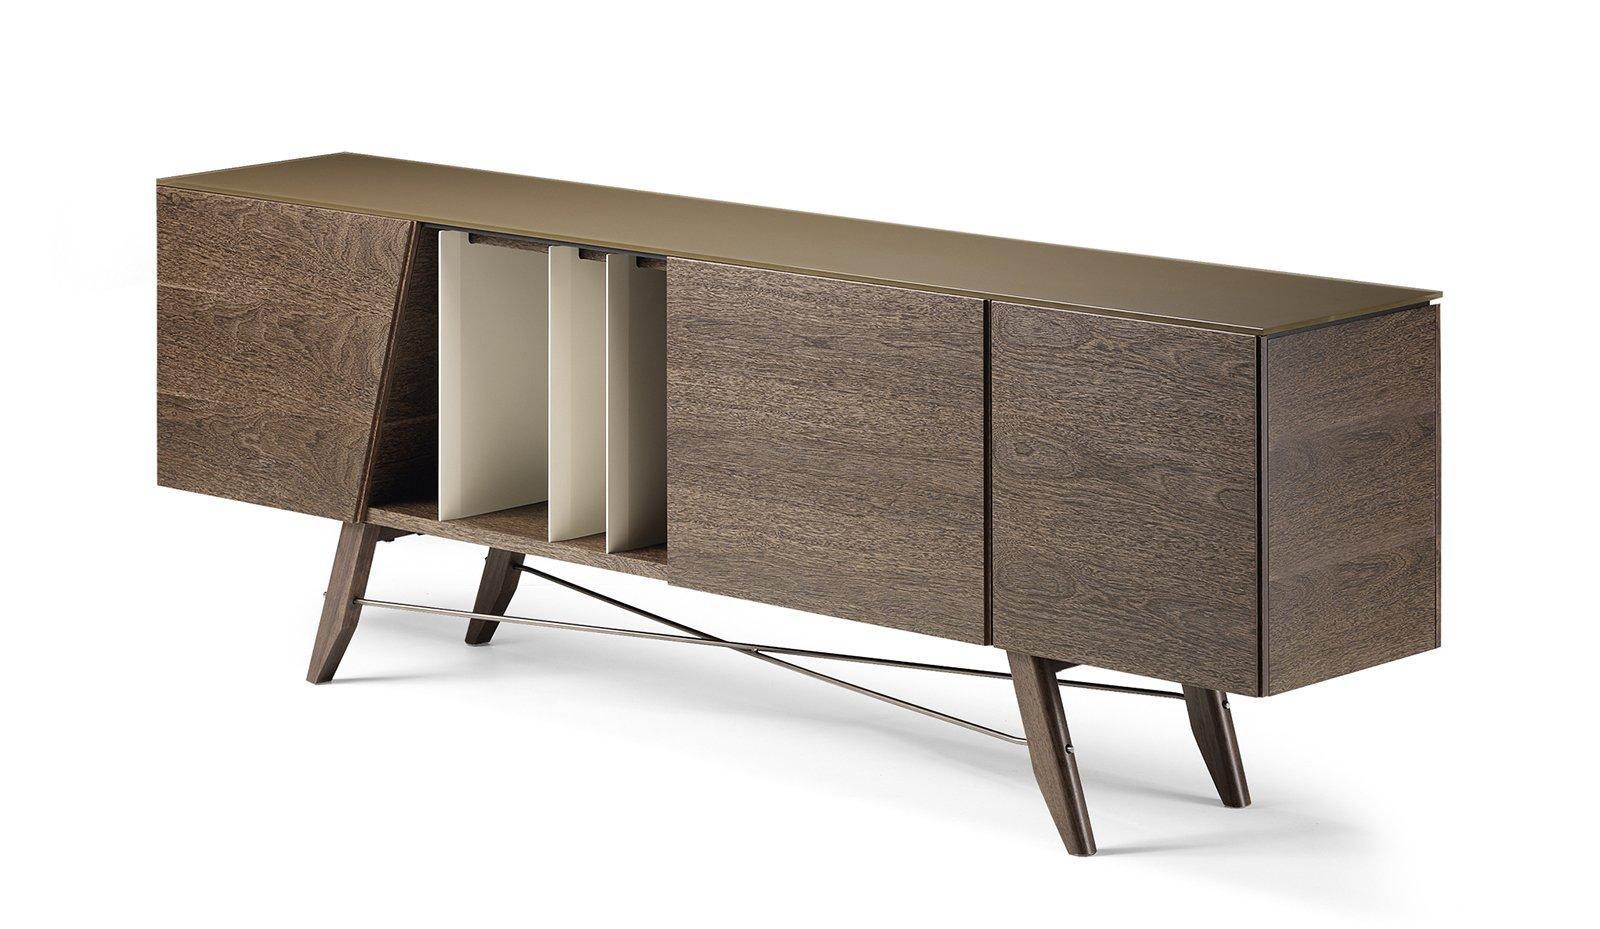 Madie mobili bassi per contenere cose di casa - Gambe mobili anni 50 ...